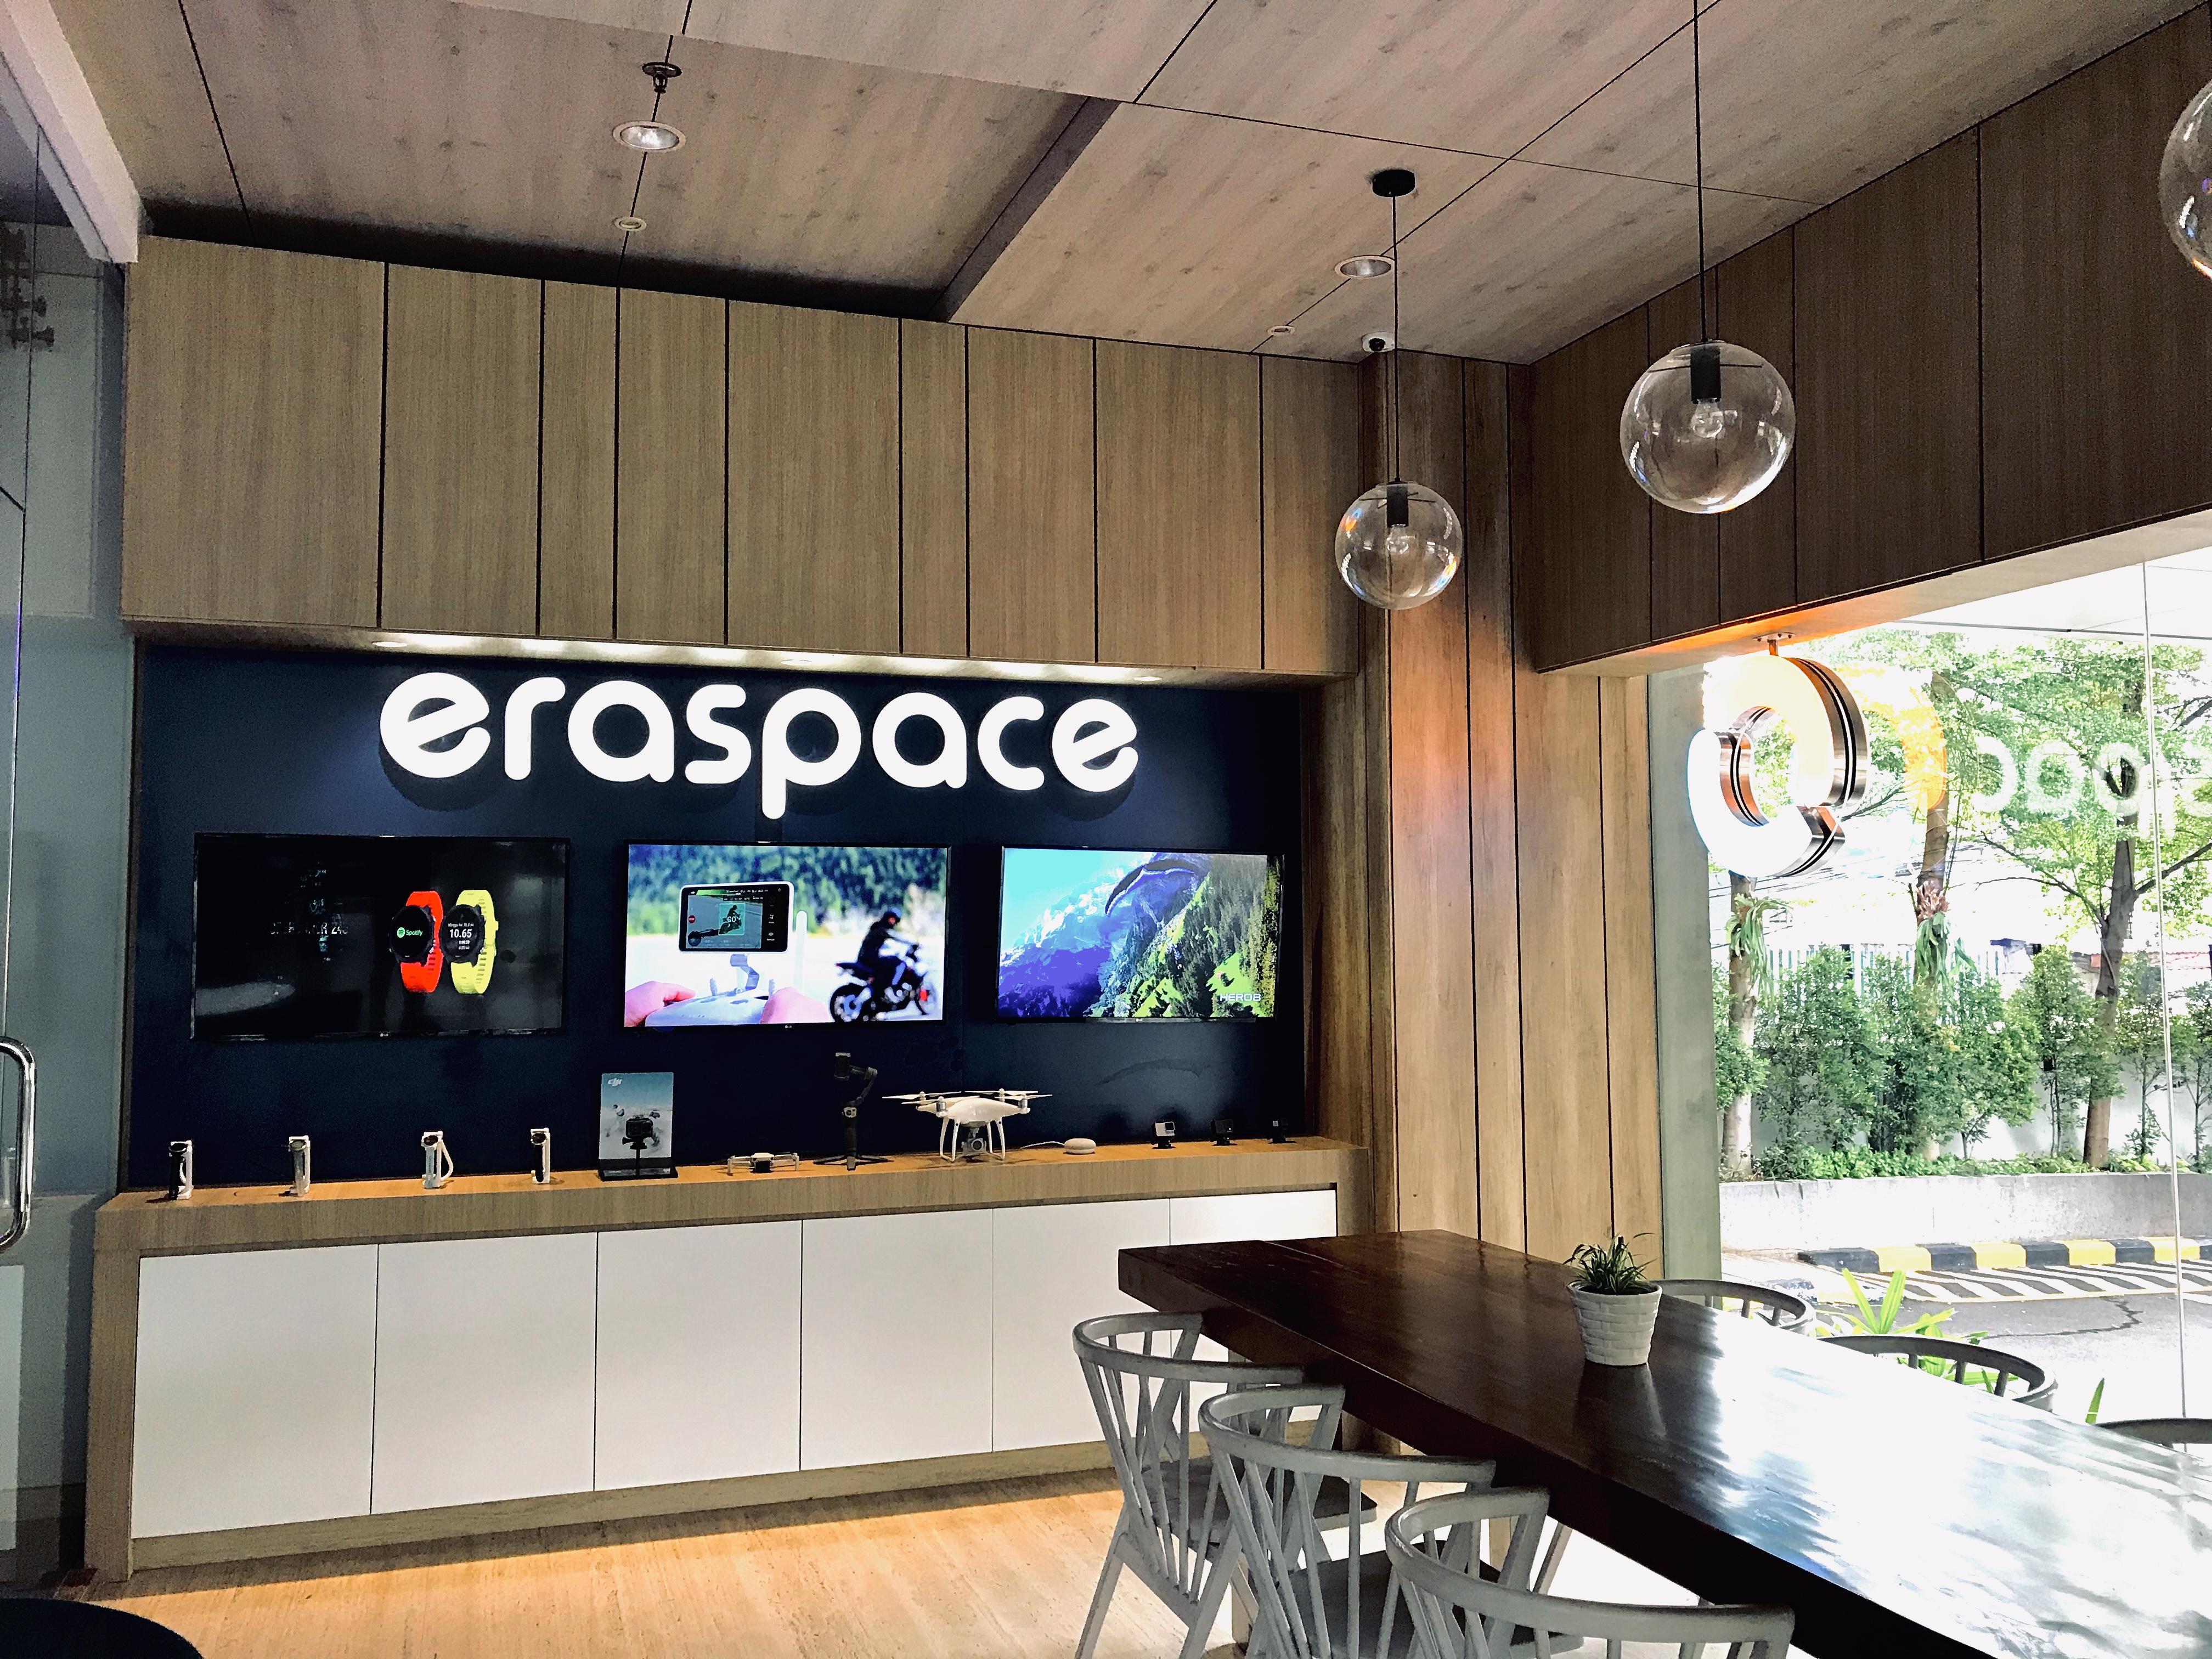 eraspace-thumbnail.jpg